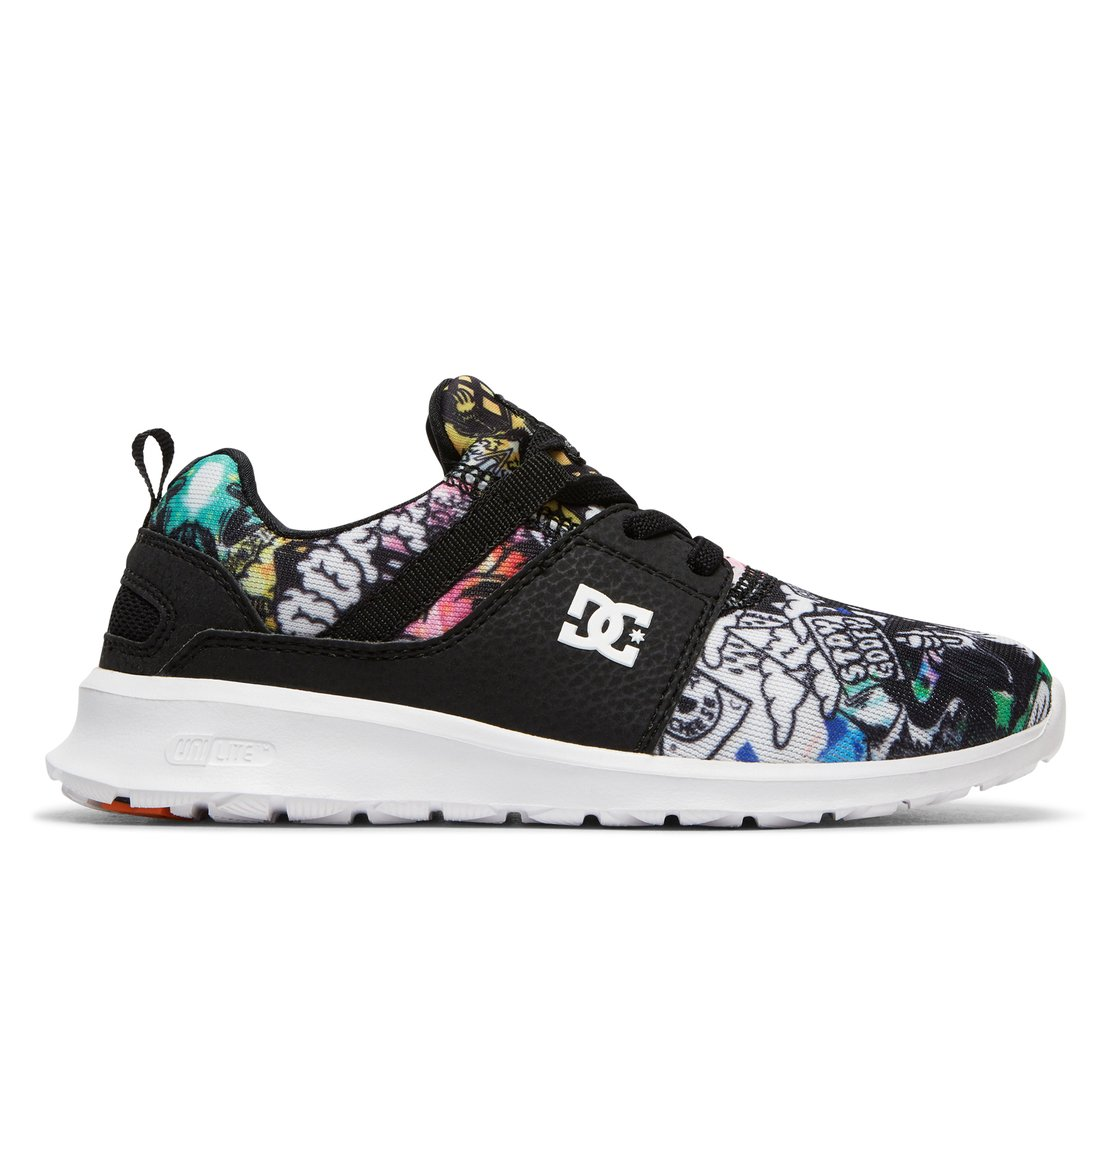 DC Shoes Heathrow - Shoes - Schuhe - Jungen - EU 32.5 - Schwarz